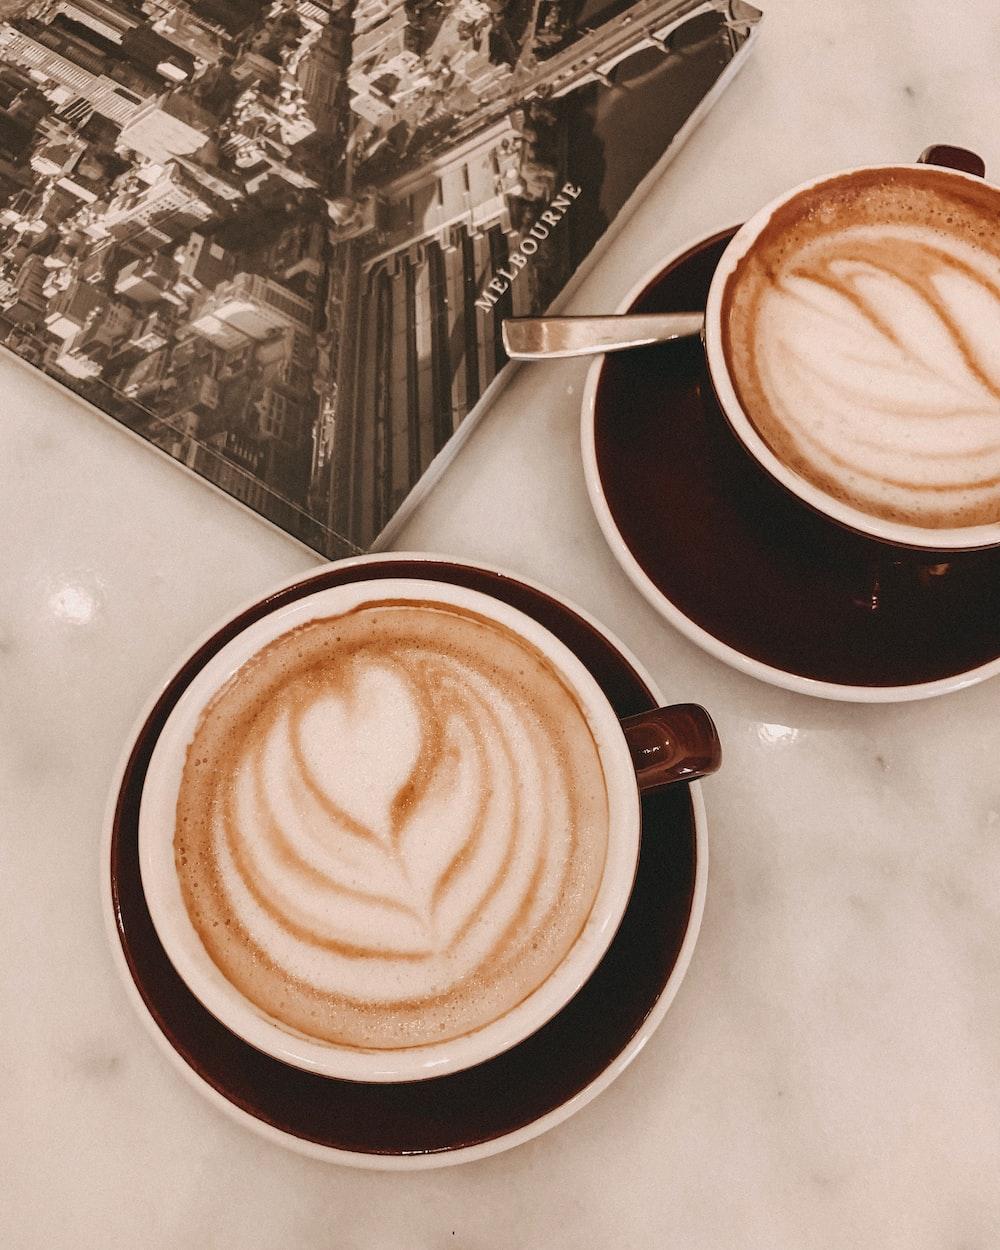 two lattes